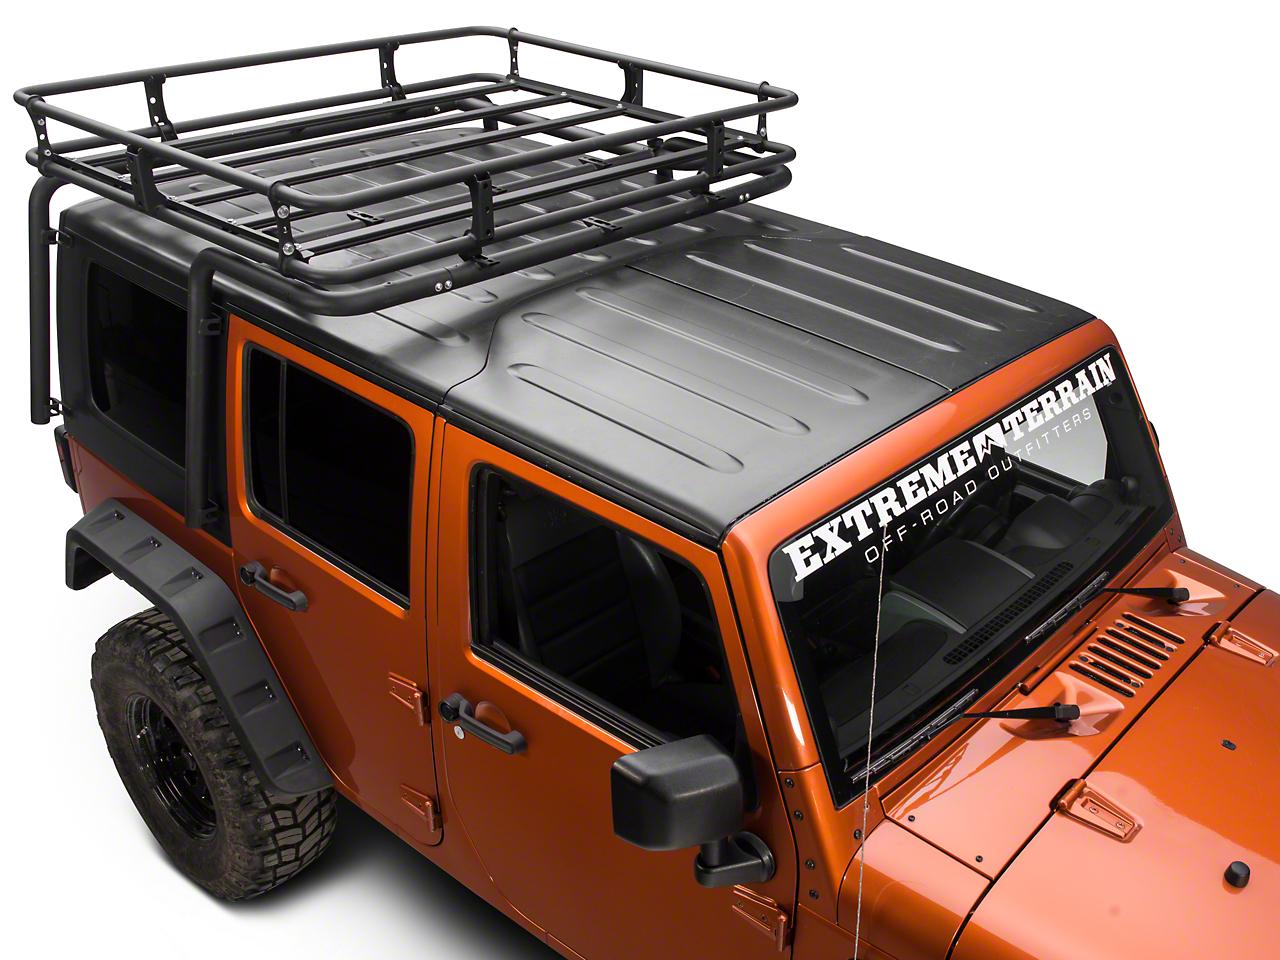 Off Camber Fabrications by MBRP Cargo Basket Kit, Black Coated (07-10 Wrangler JK 4 Door)